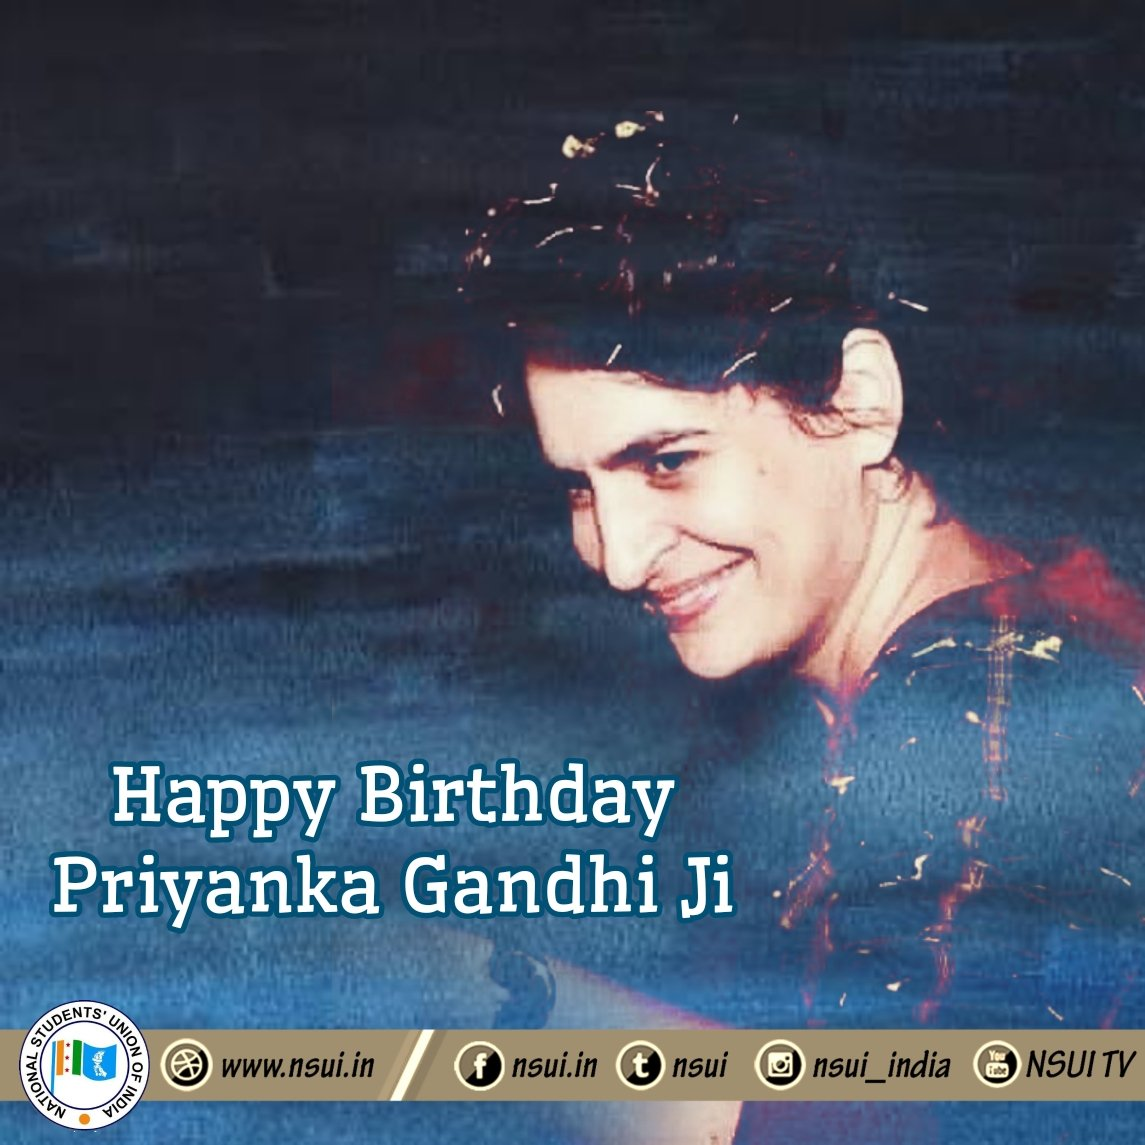 Wishing Priyanka Gandhi Ji a Very Happy Birthday!